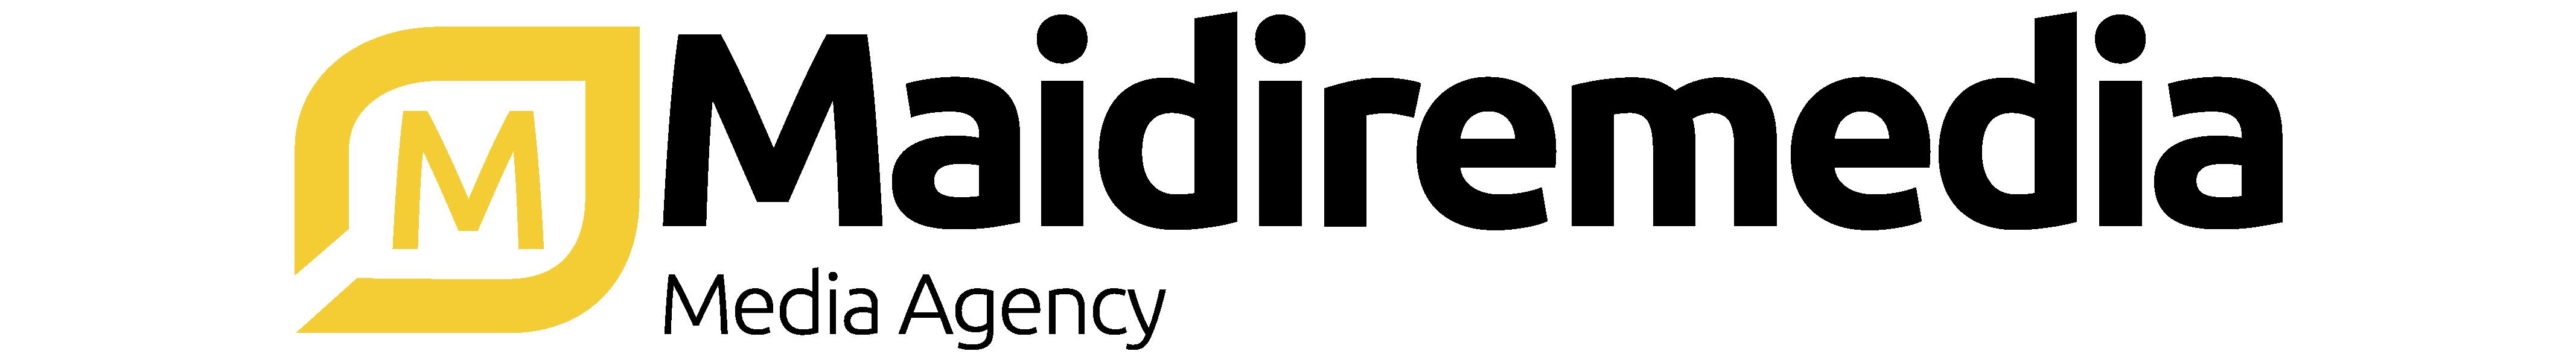 Maidiremedia web agency